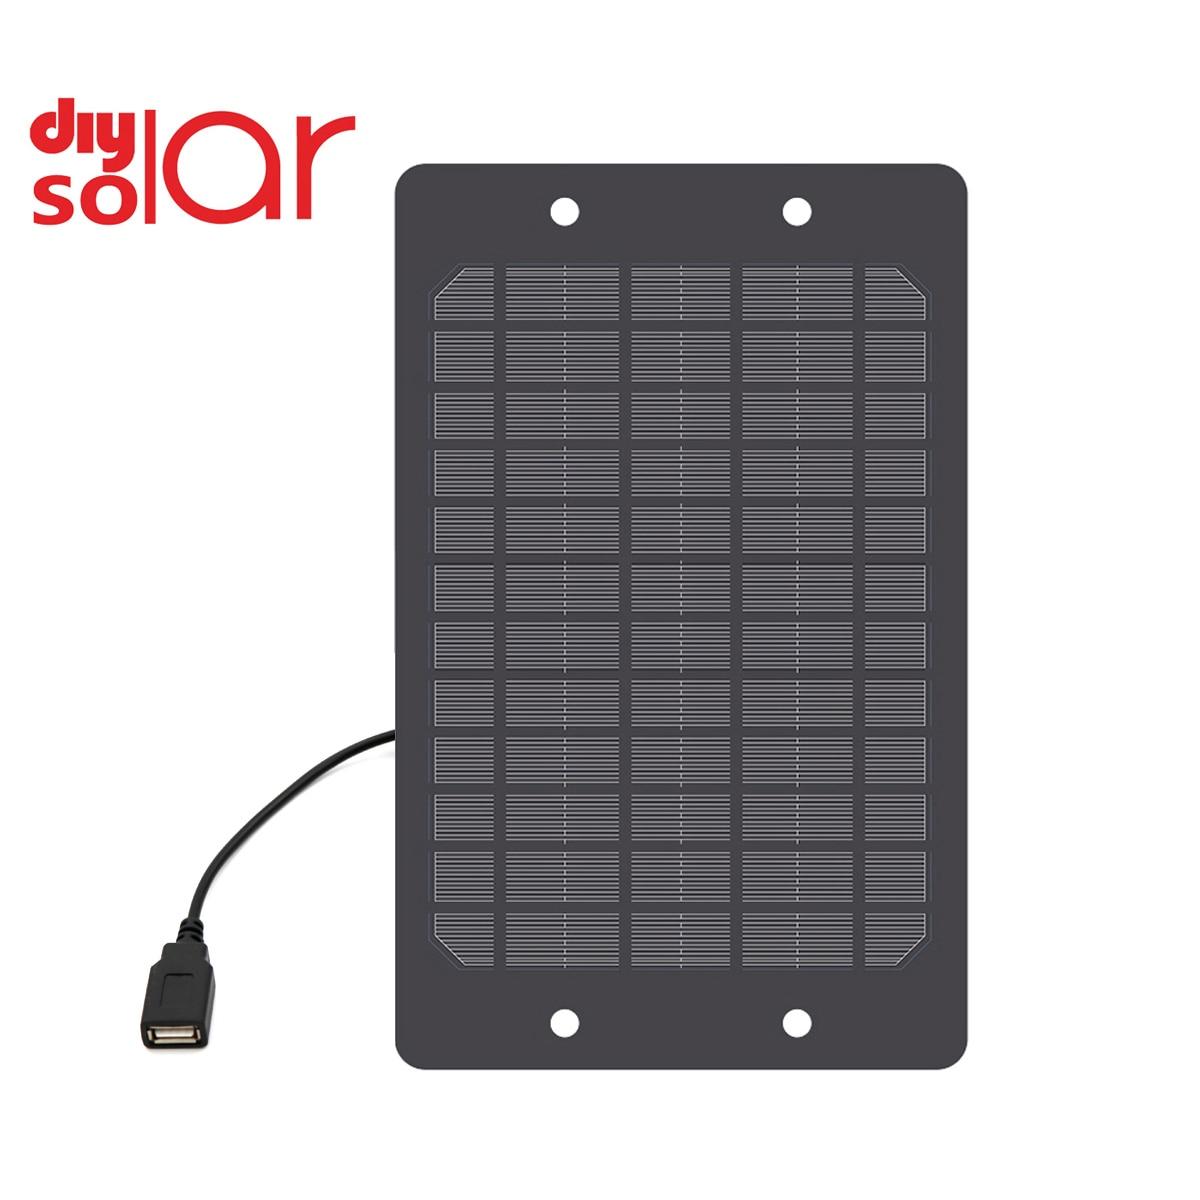 5V 1200mA 6Watt Battery Charger USB port DC 5.5*2.1 Charge Regulators Solar Panel 6W Outdoor Power Li ion Batteries Portable|Solar Cells| - AliExpress